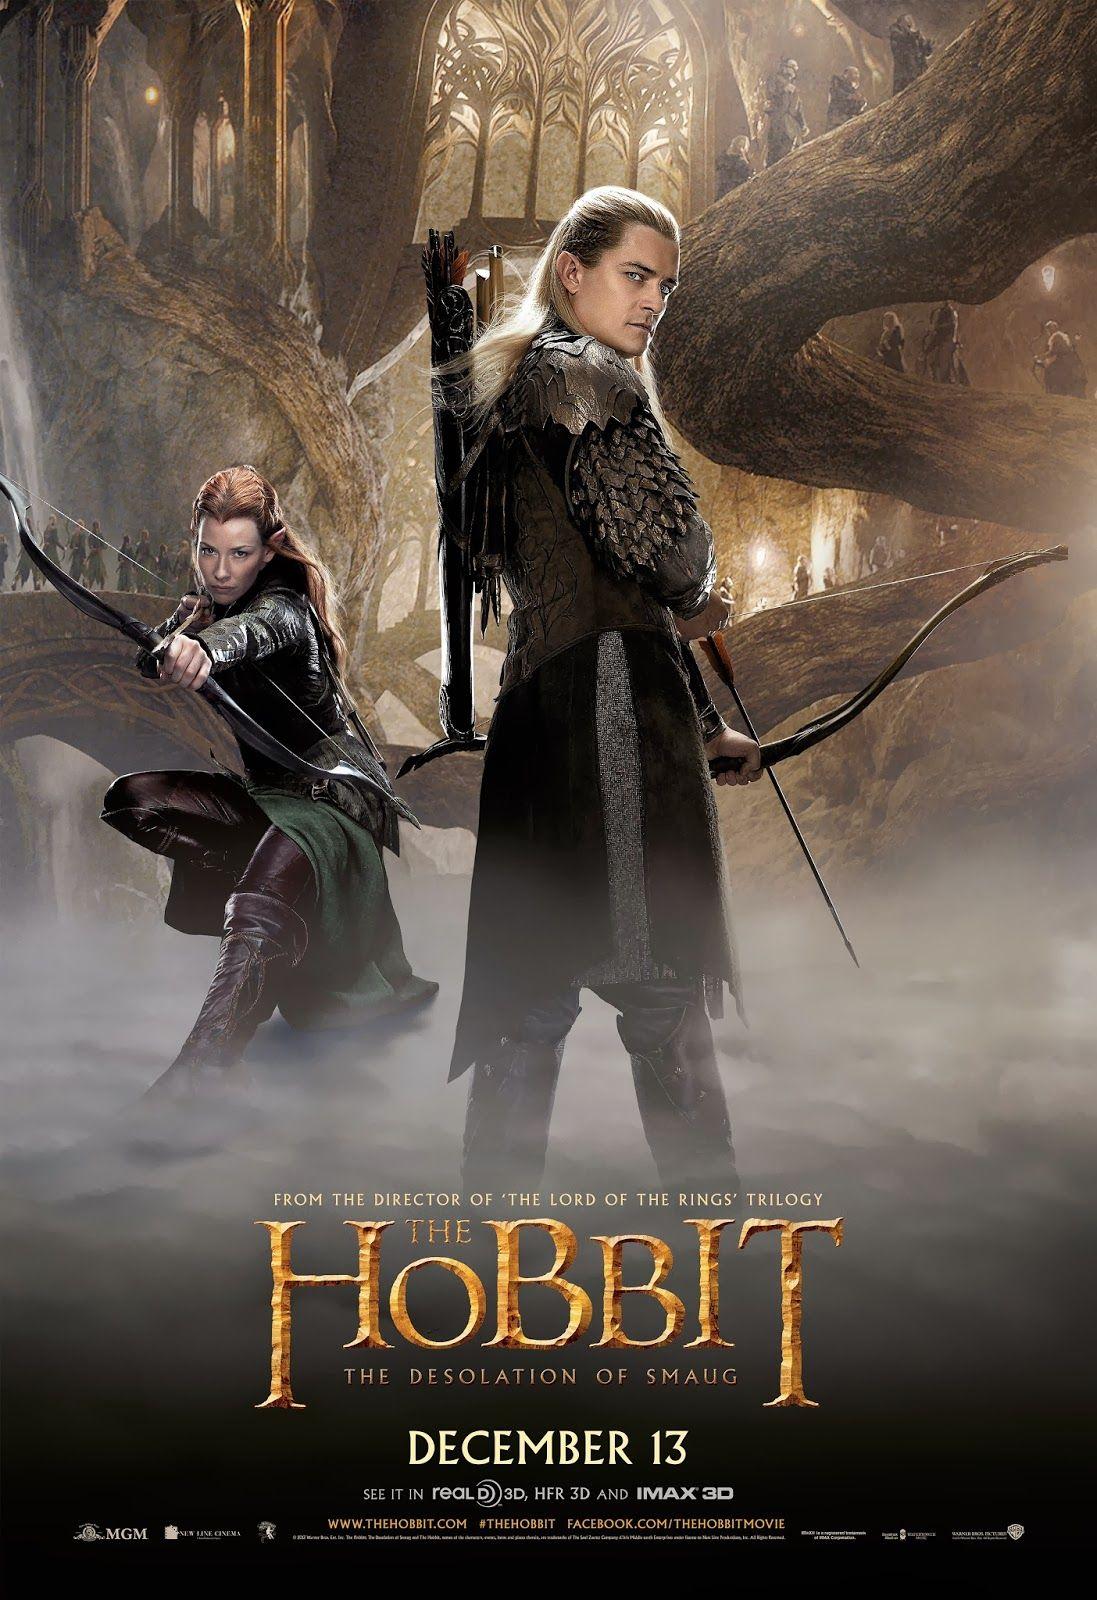 the hobbit: the desolation of smaug international poster- legolas